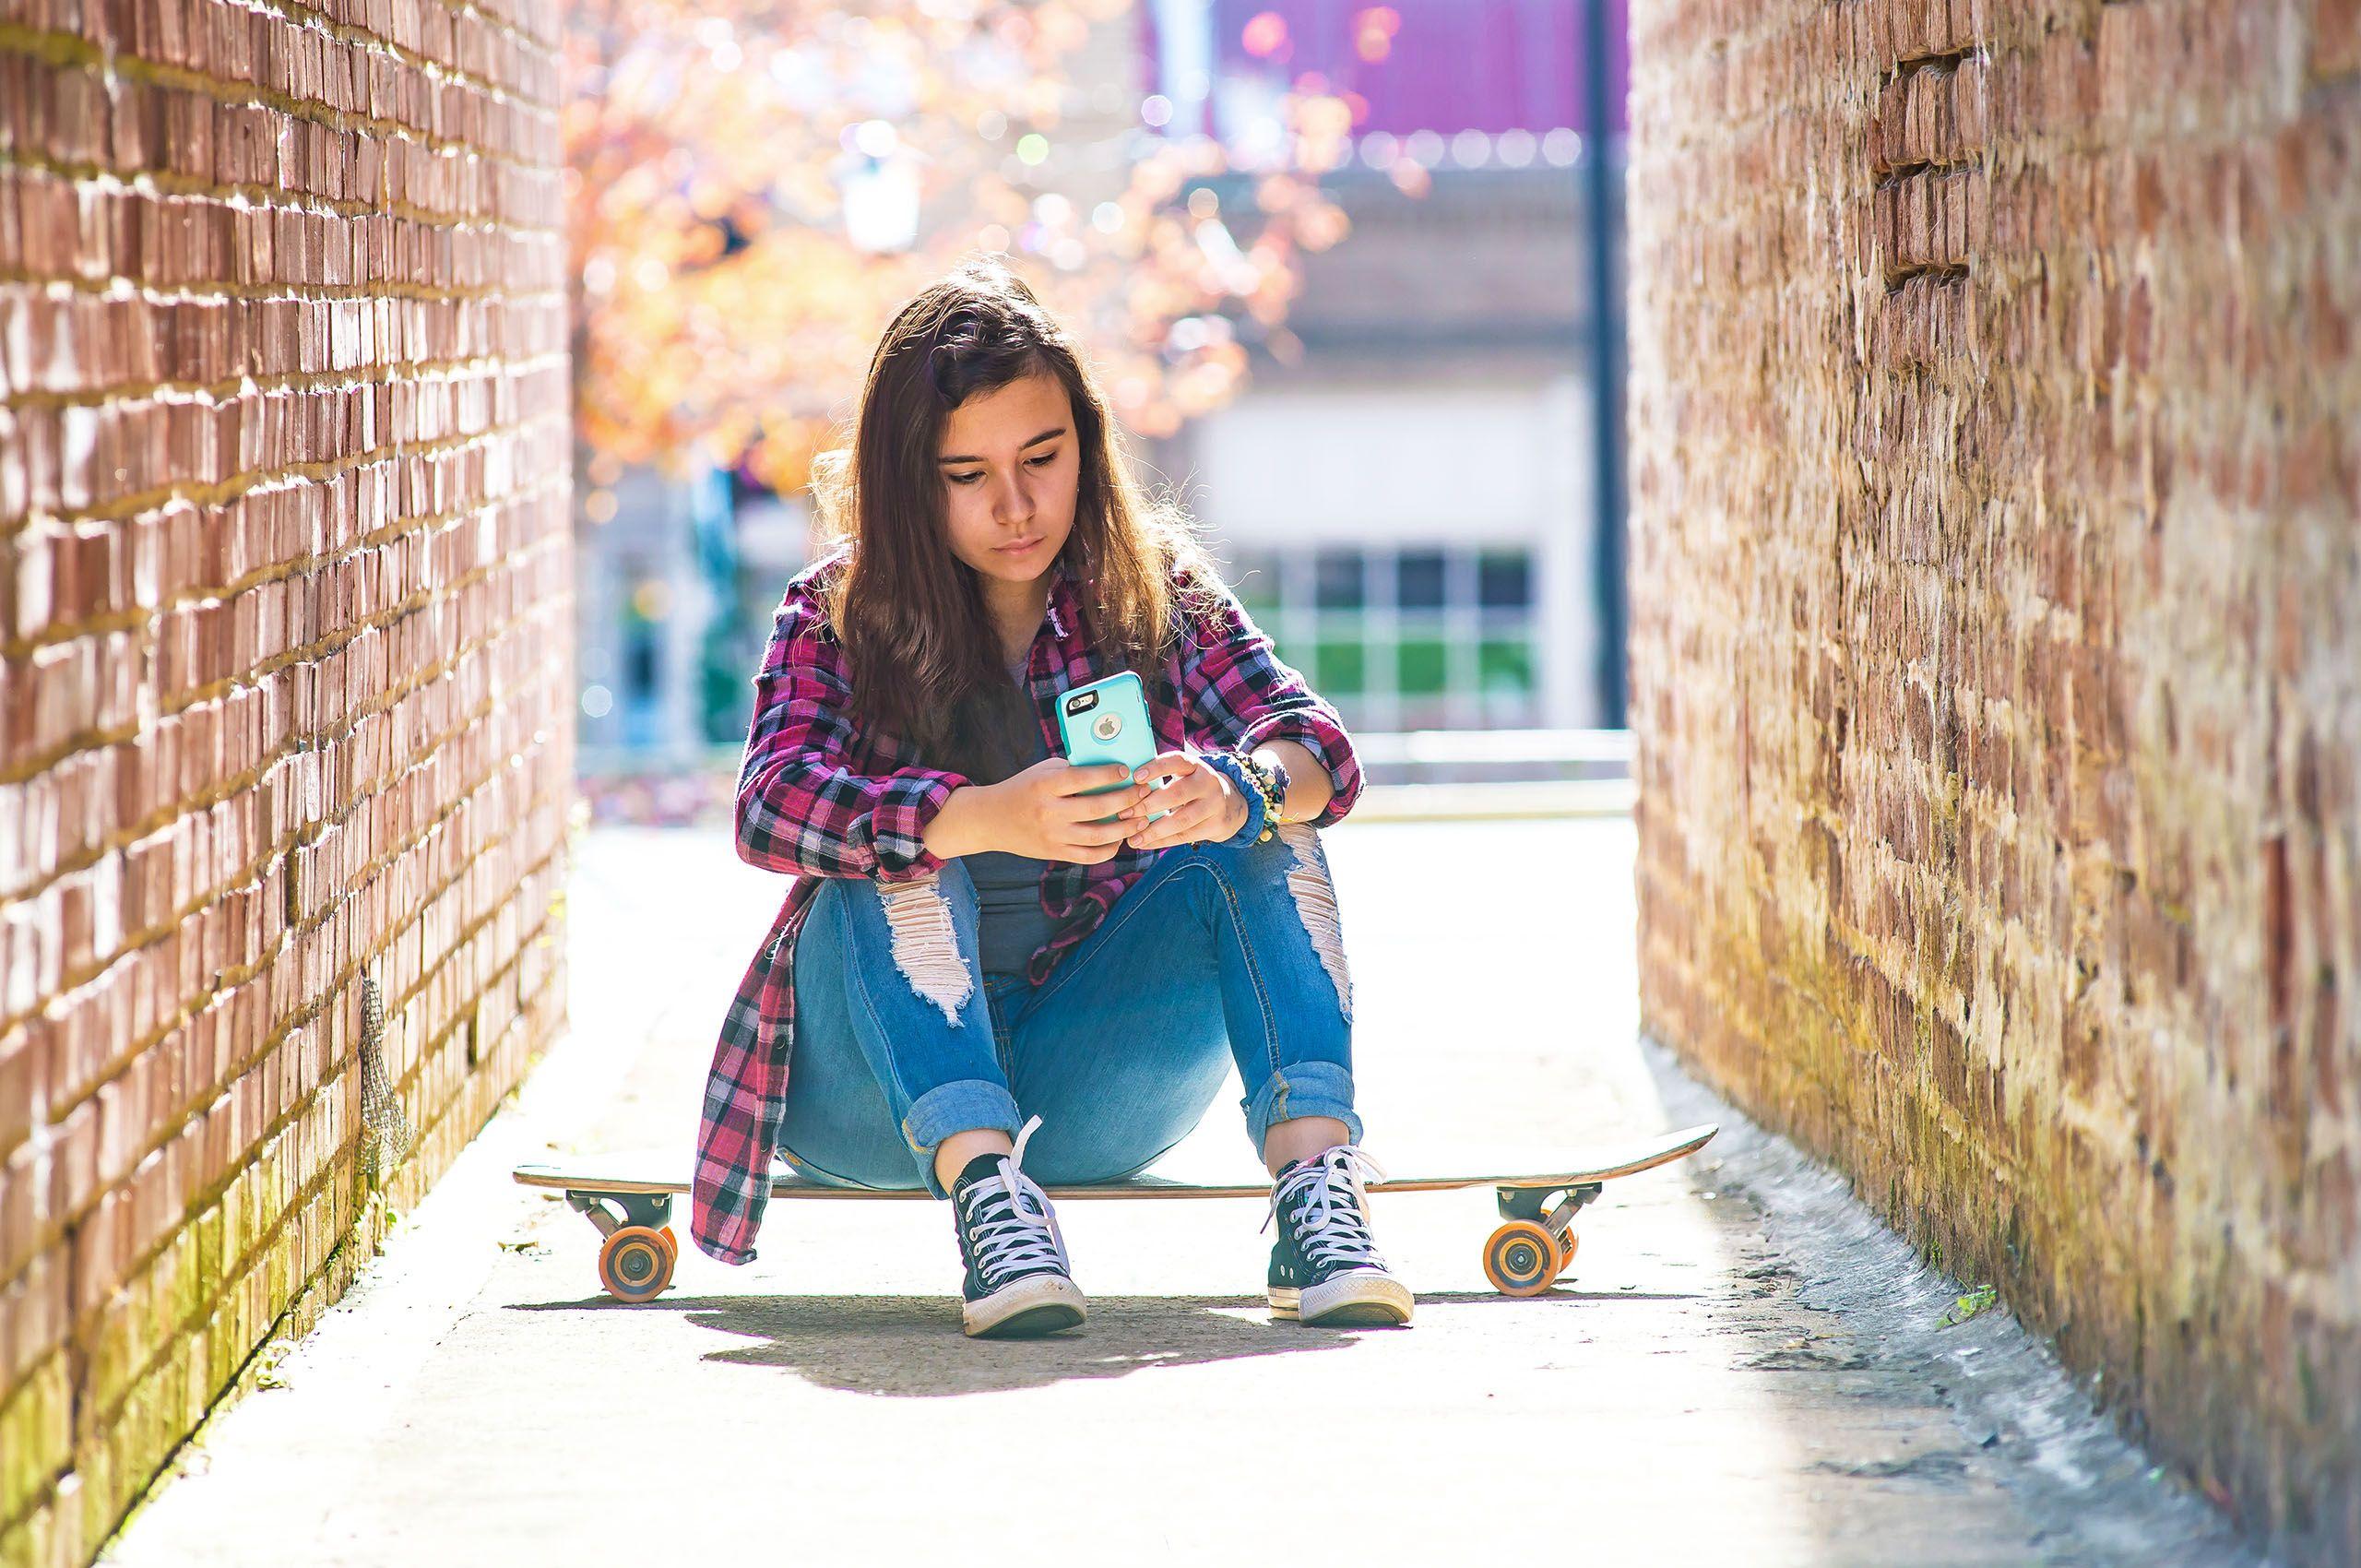 Jilly_Skateboard_LB.jpg